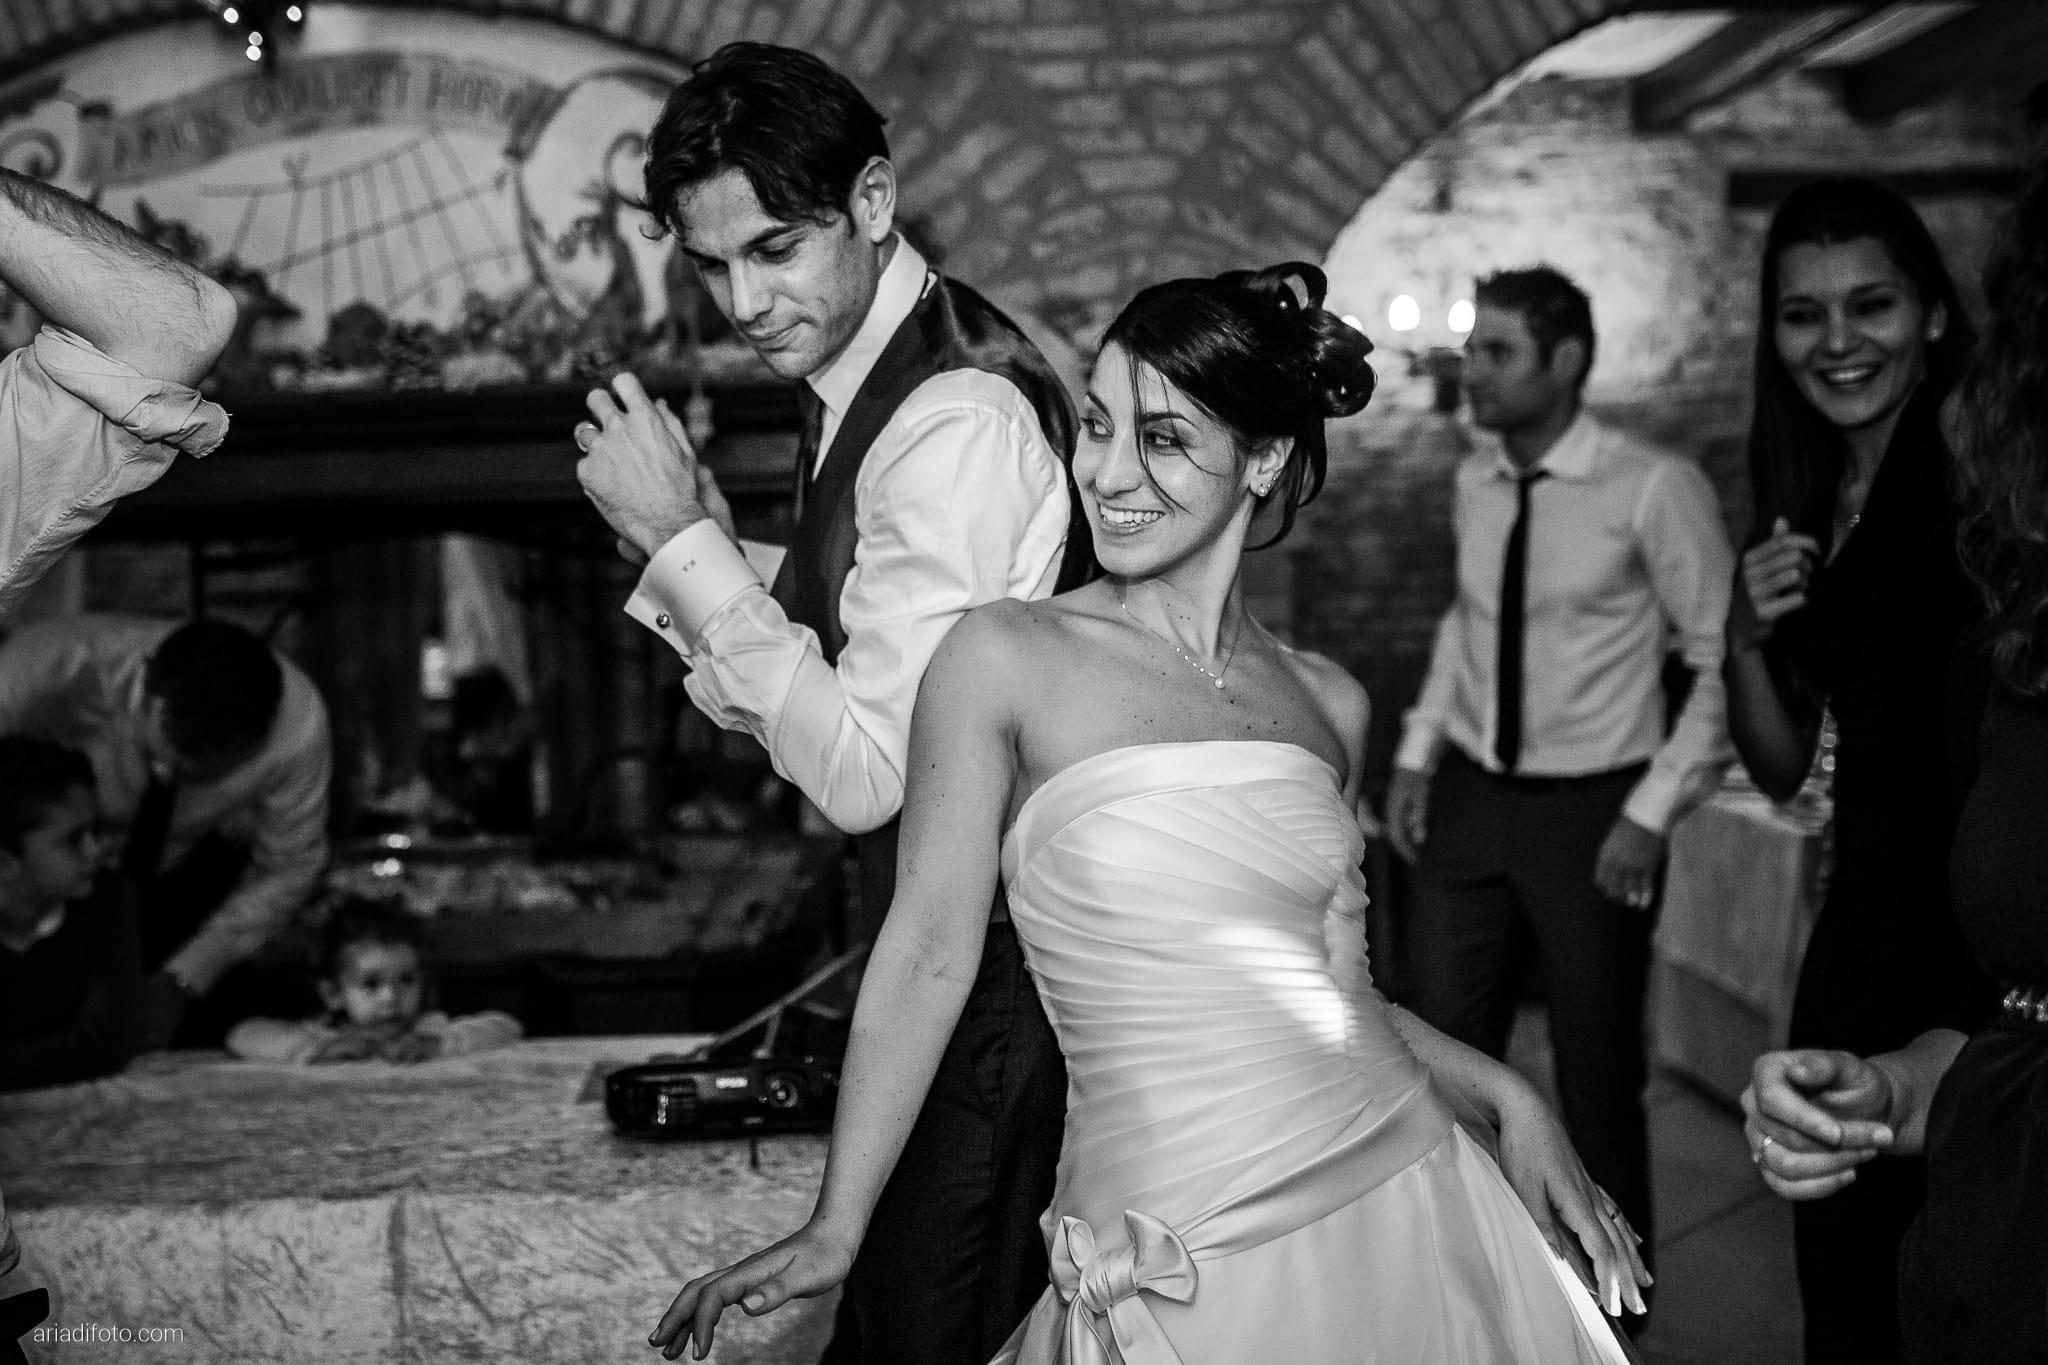 Elisa Matteo matrimonio Preval Gorizia Paradiso Pocenia Udine ricevimento festa balli